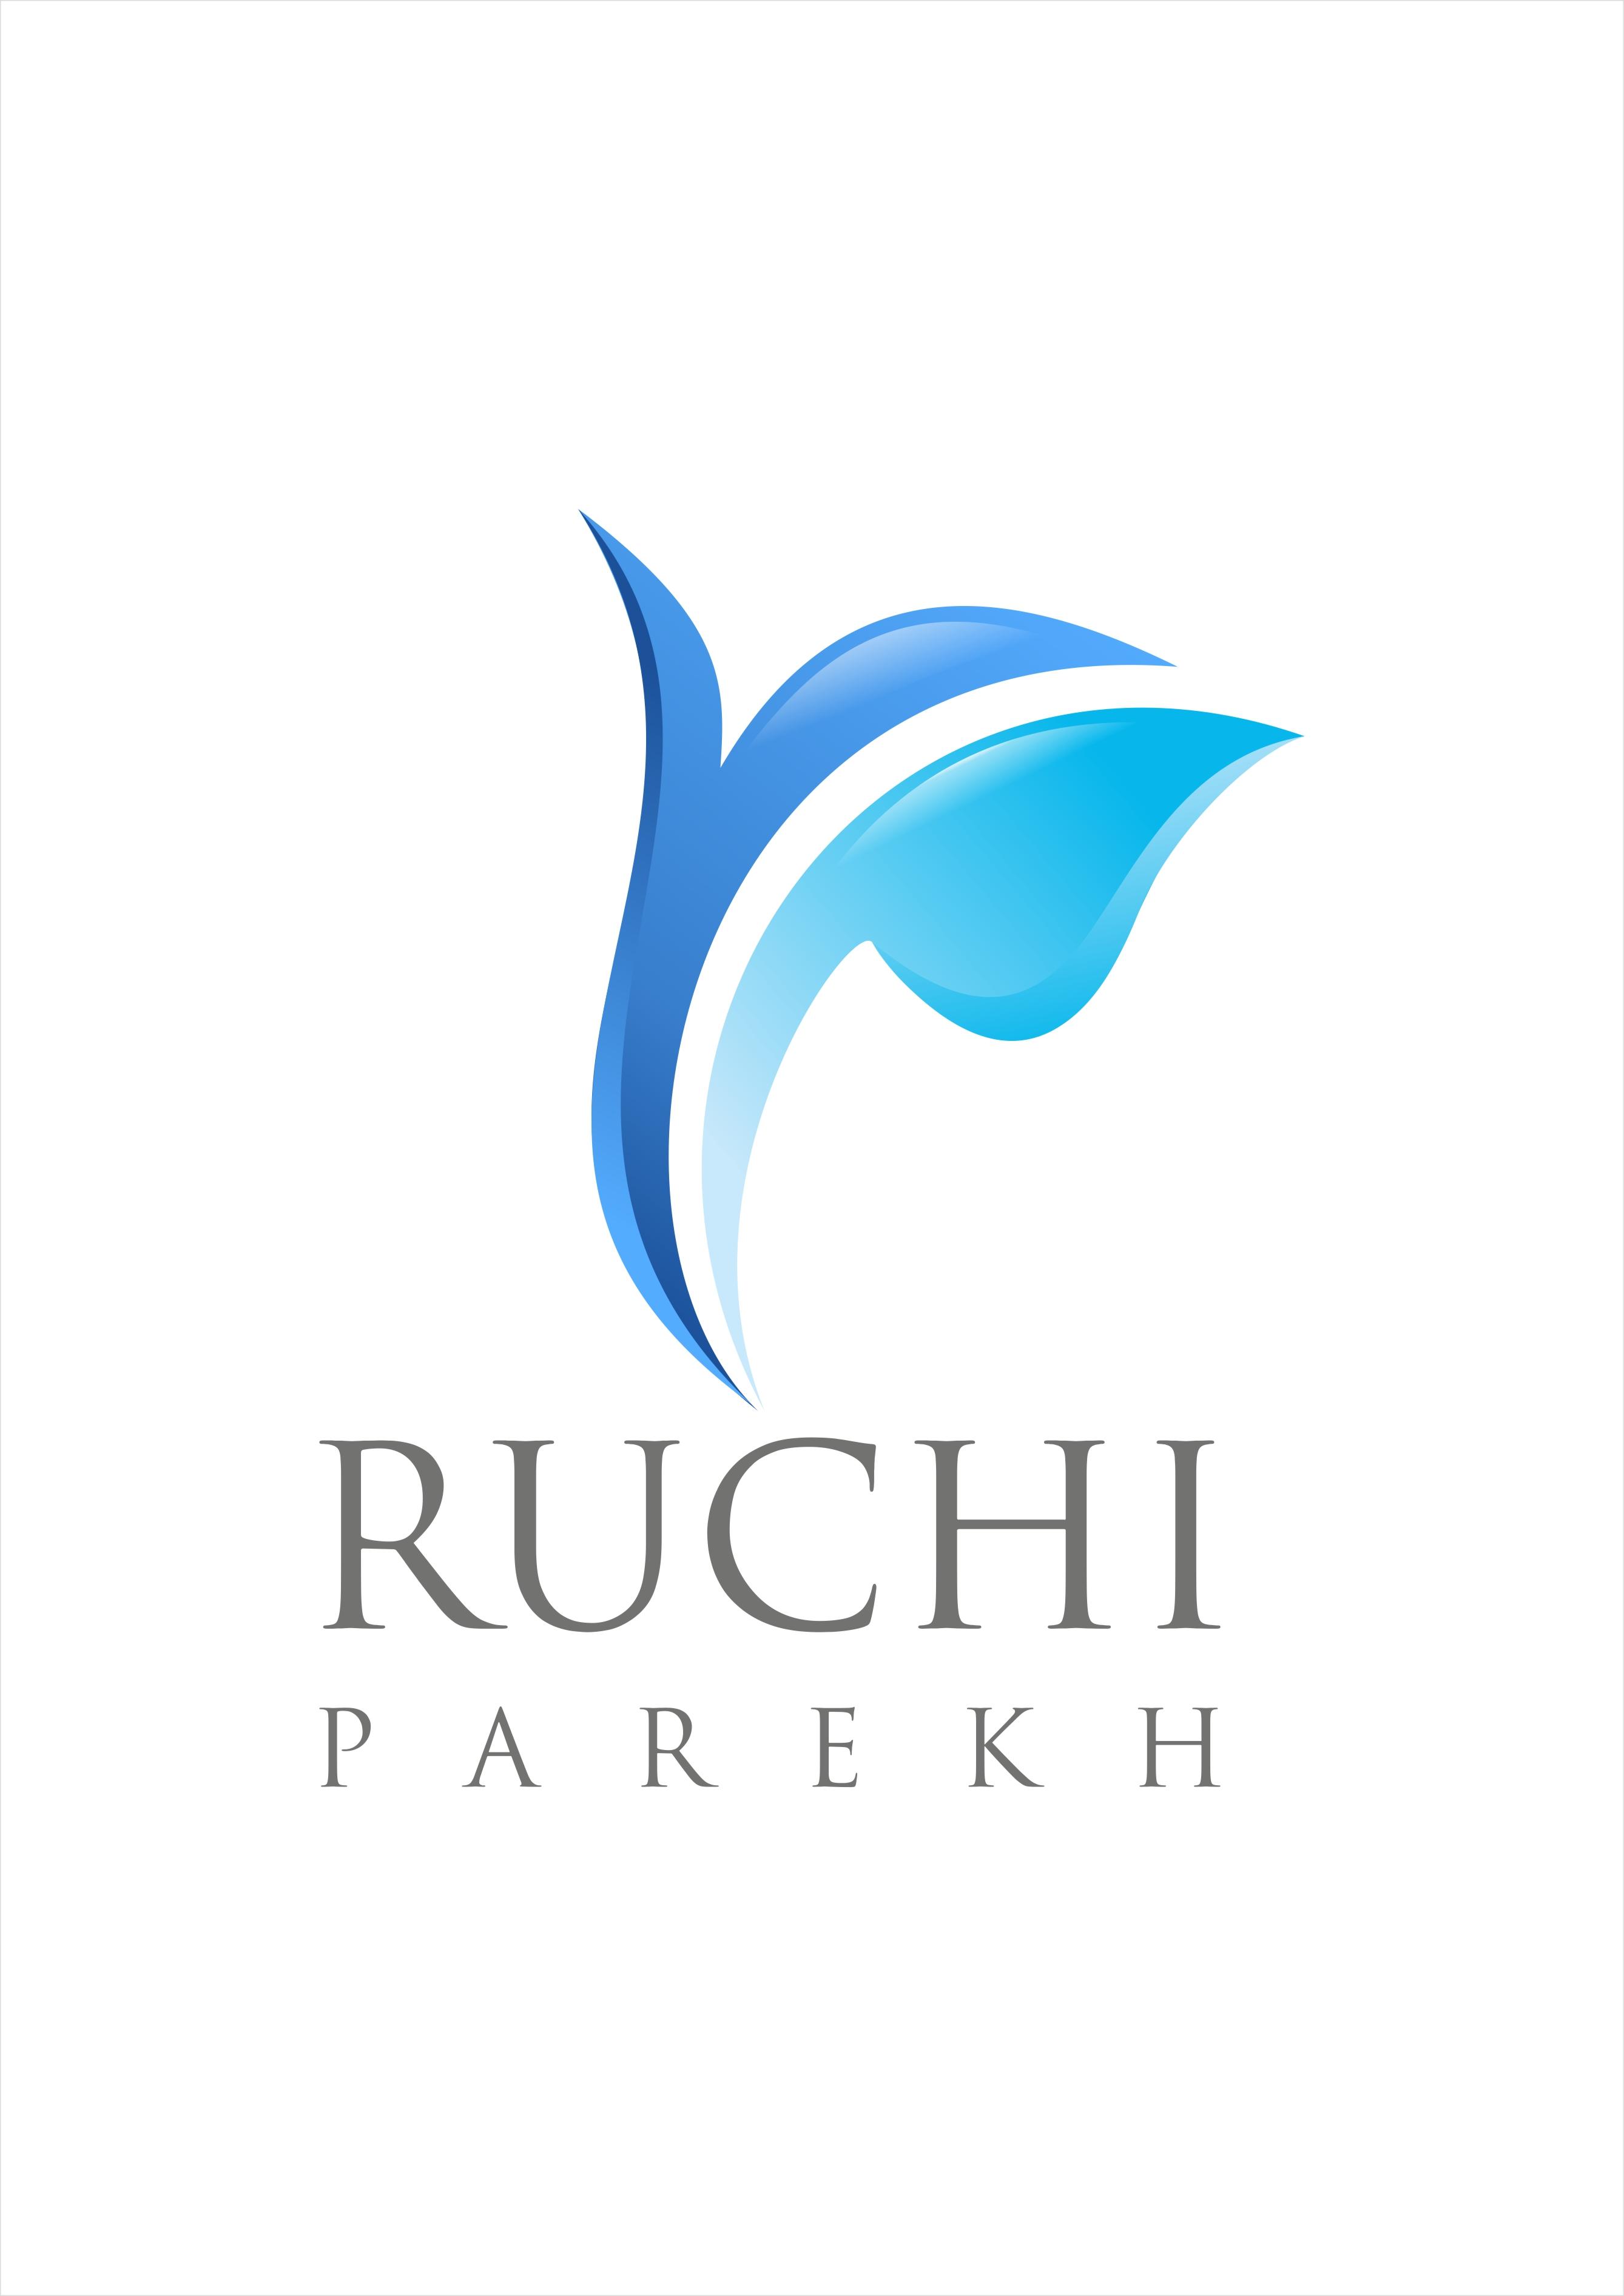 Ruchi's School